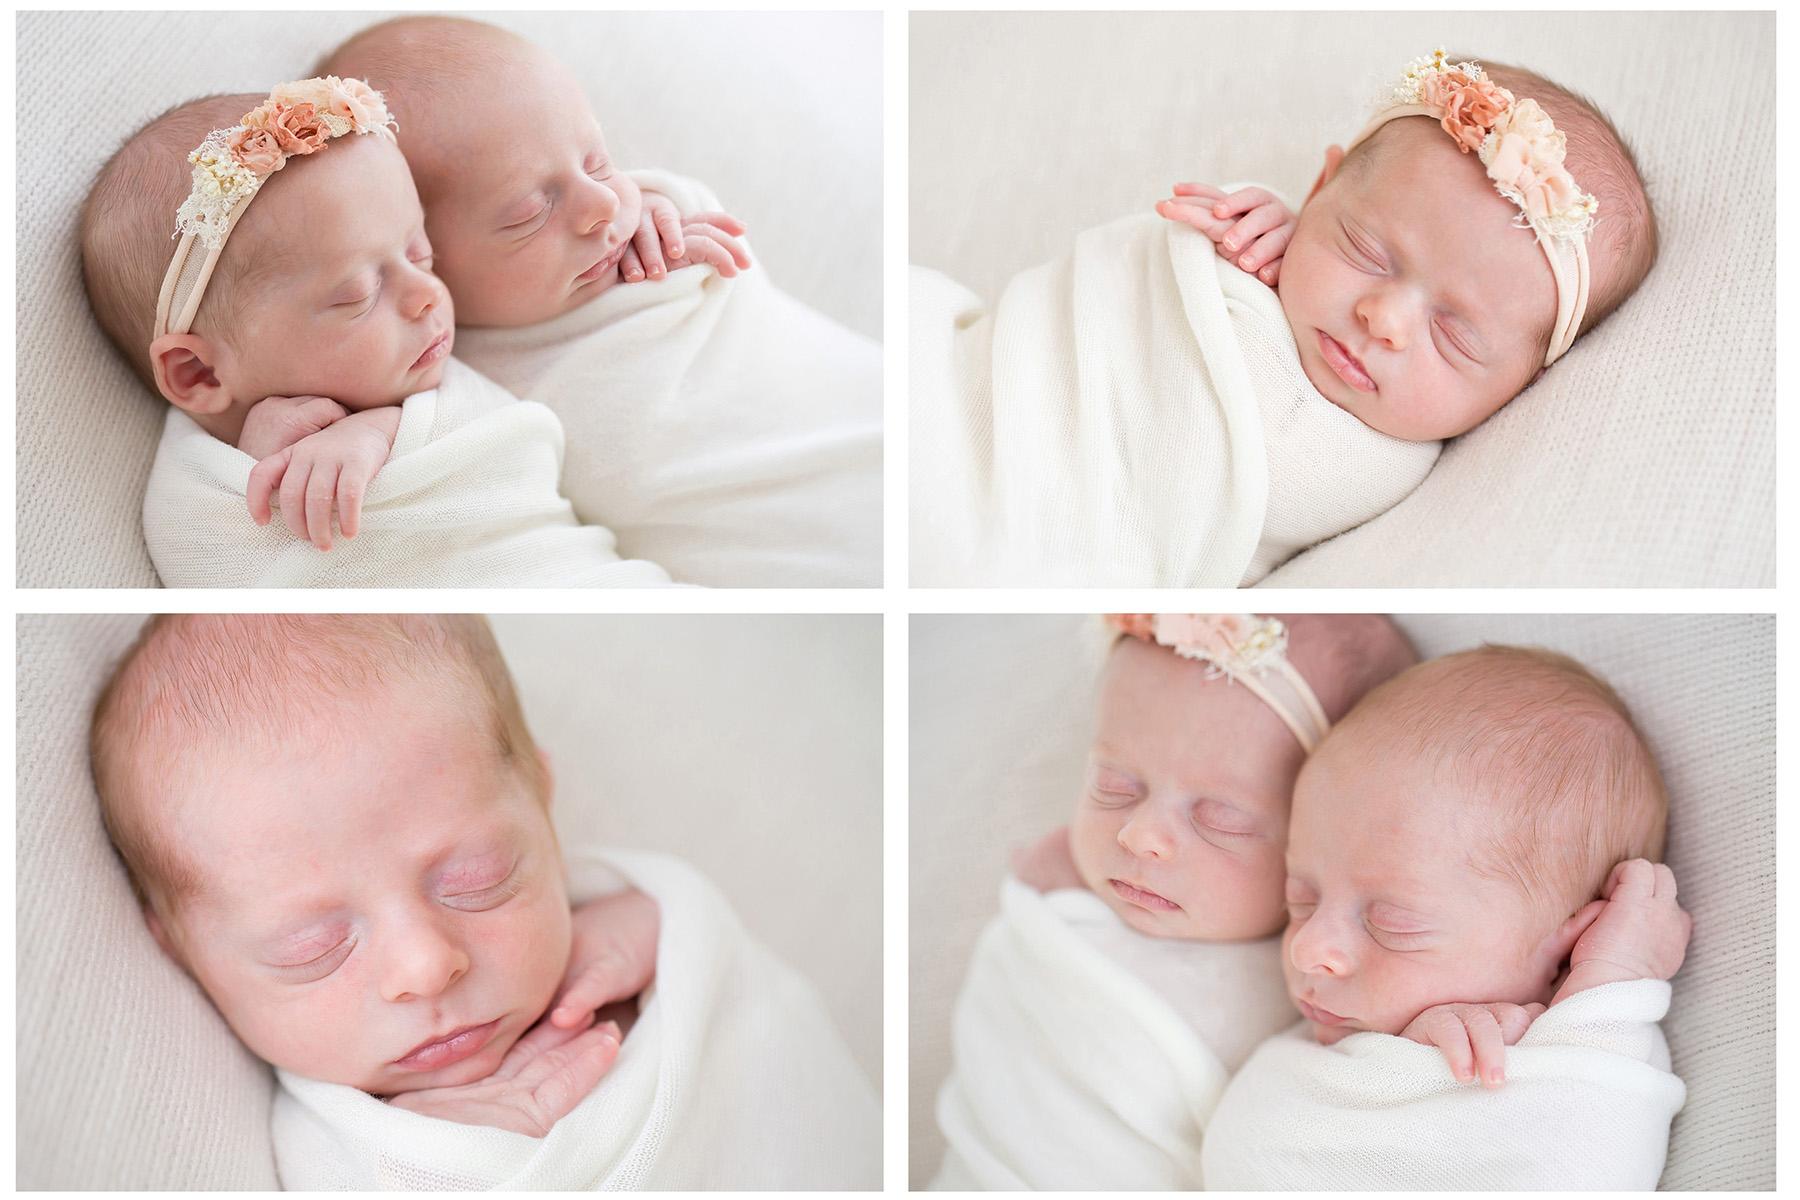 louisville ky newborn photographer   julie brock photography   louisville ky maternity photographer   louisville ky twin photographer   twin photography poses